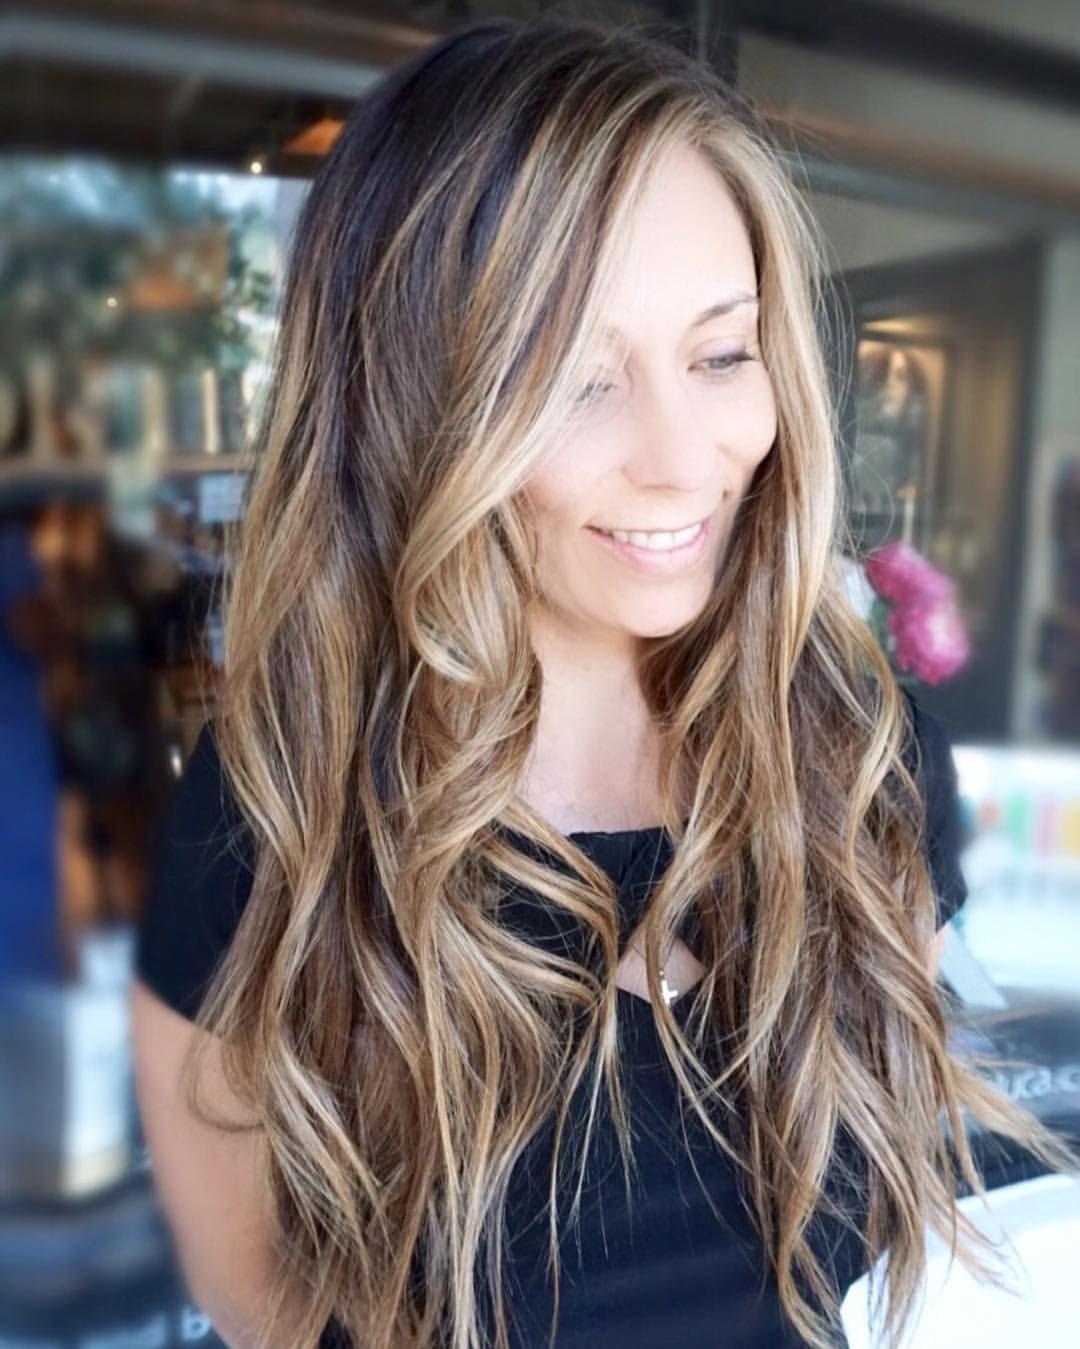 Dimensional balayage 🎨 #hairbykimjette #balayage @kimjettehair (at Winter Park, Florida)